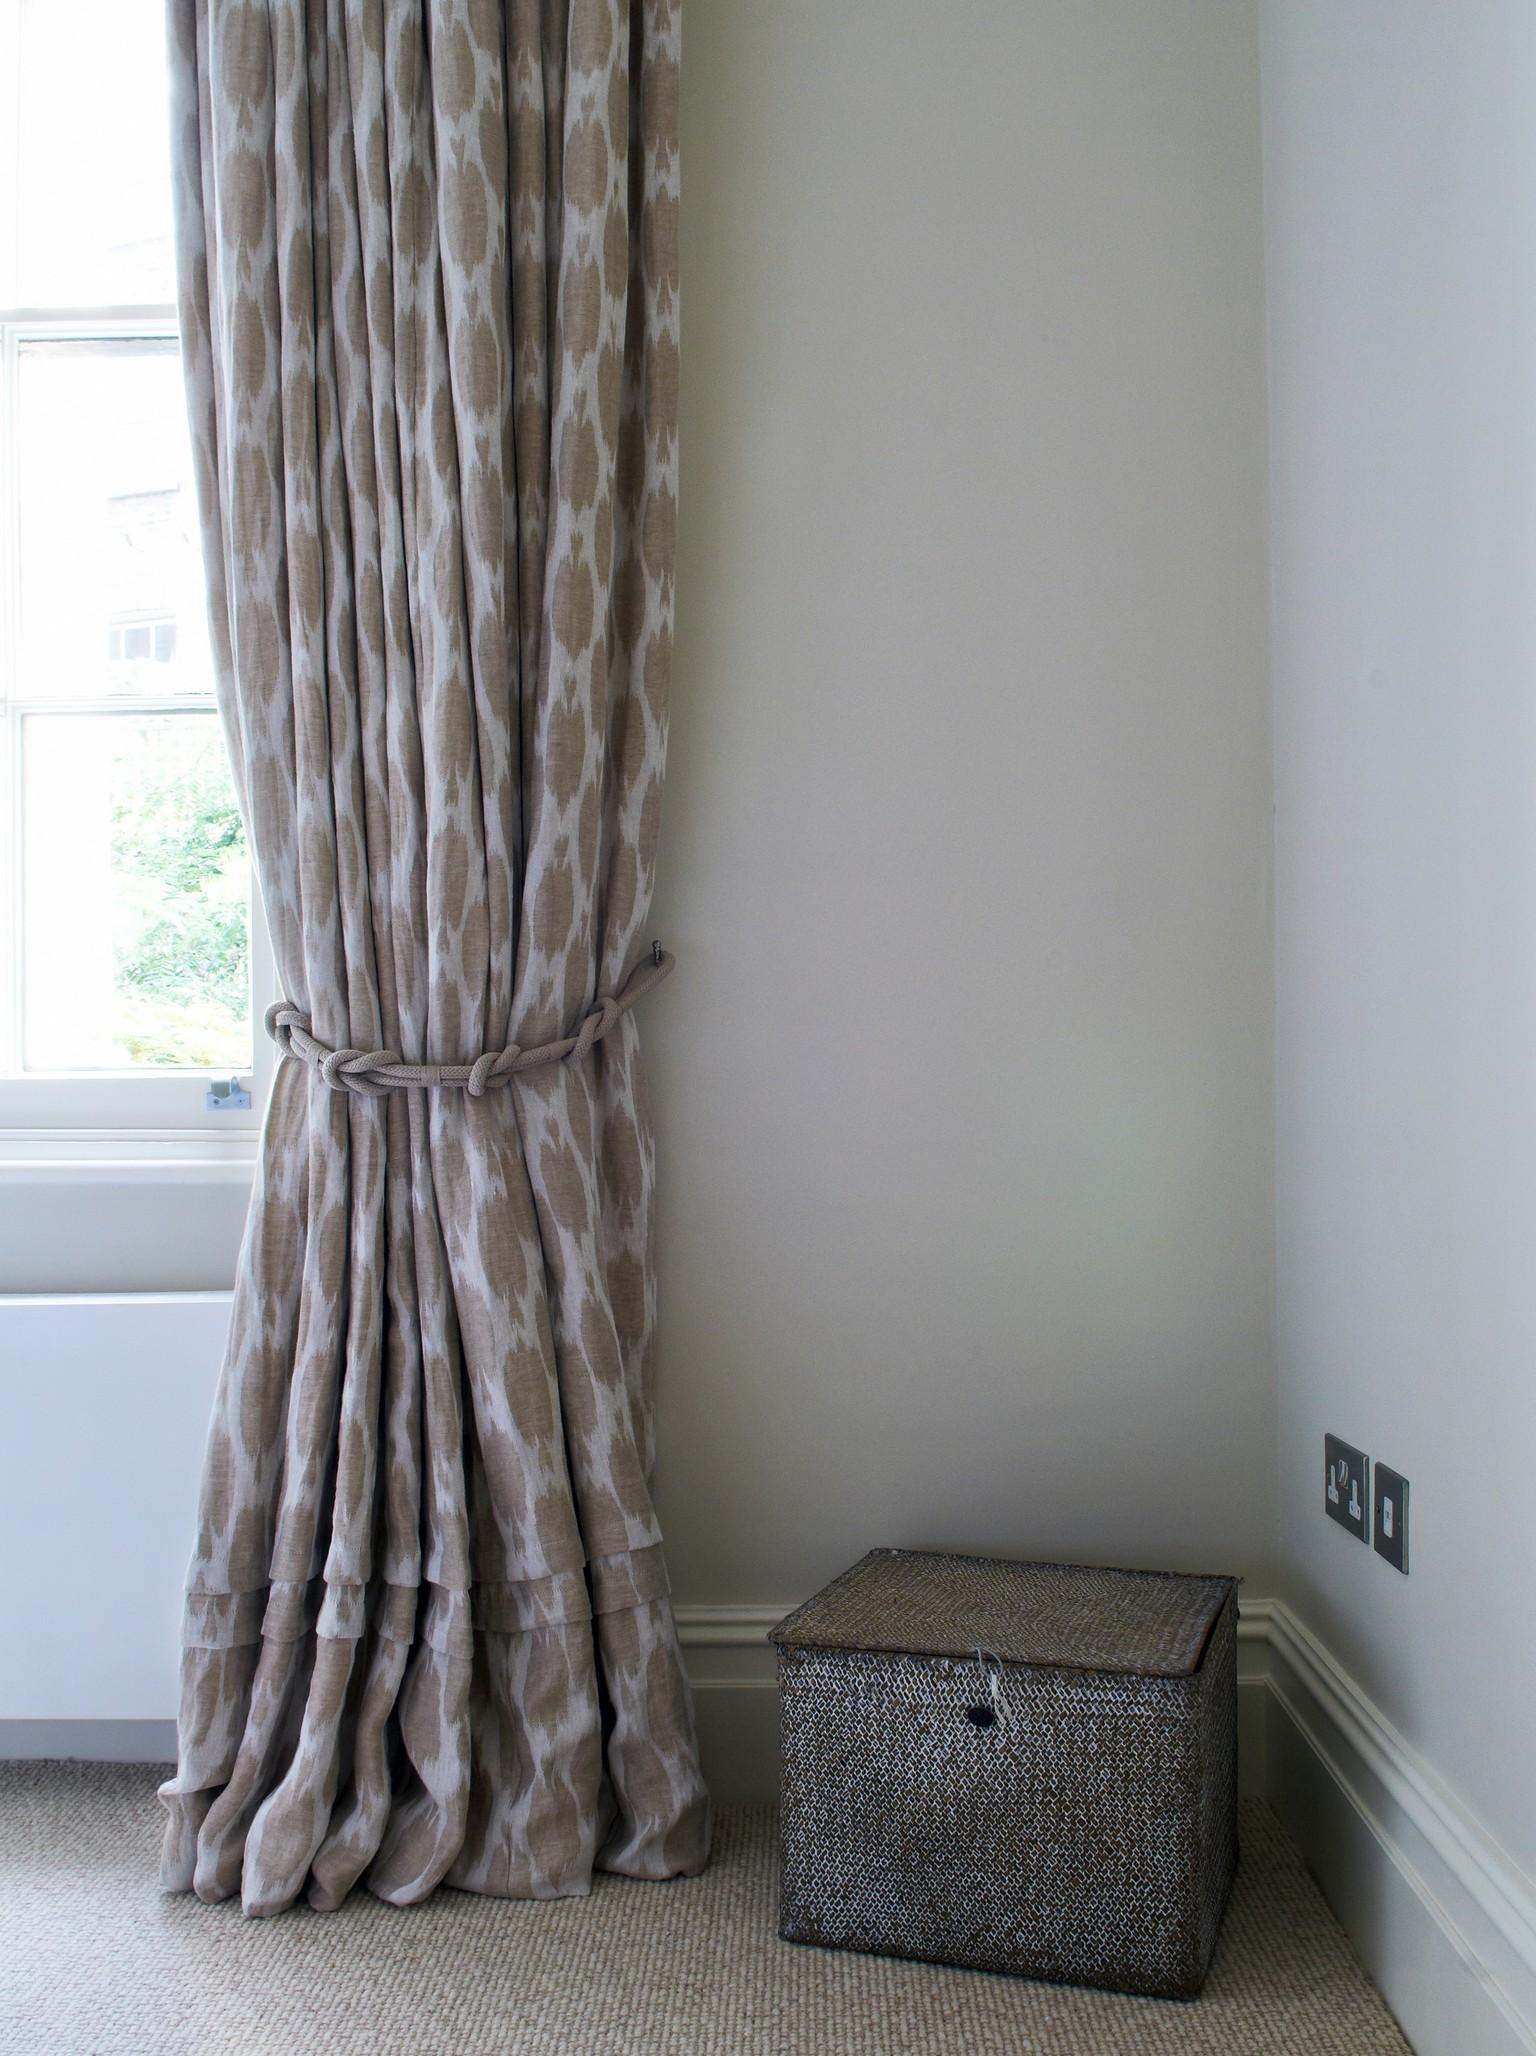 ribbed luxury carpet near window